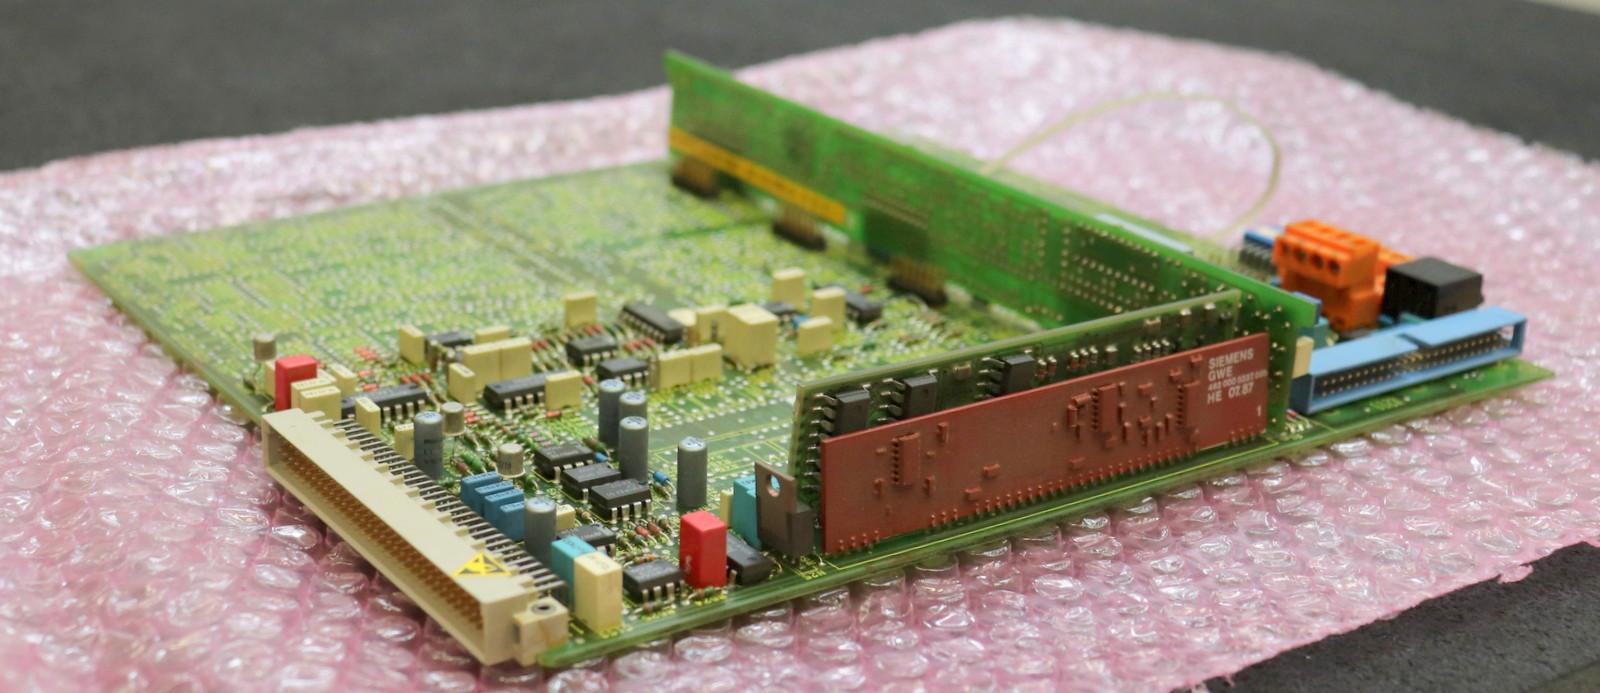 Siemens Simodrive 6sc6100-0na01 462010.9070.01 TOP Condizione